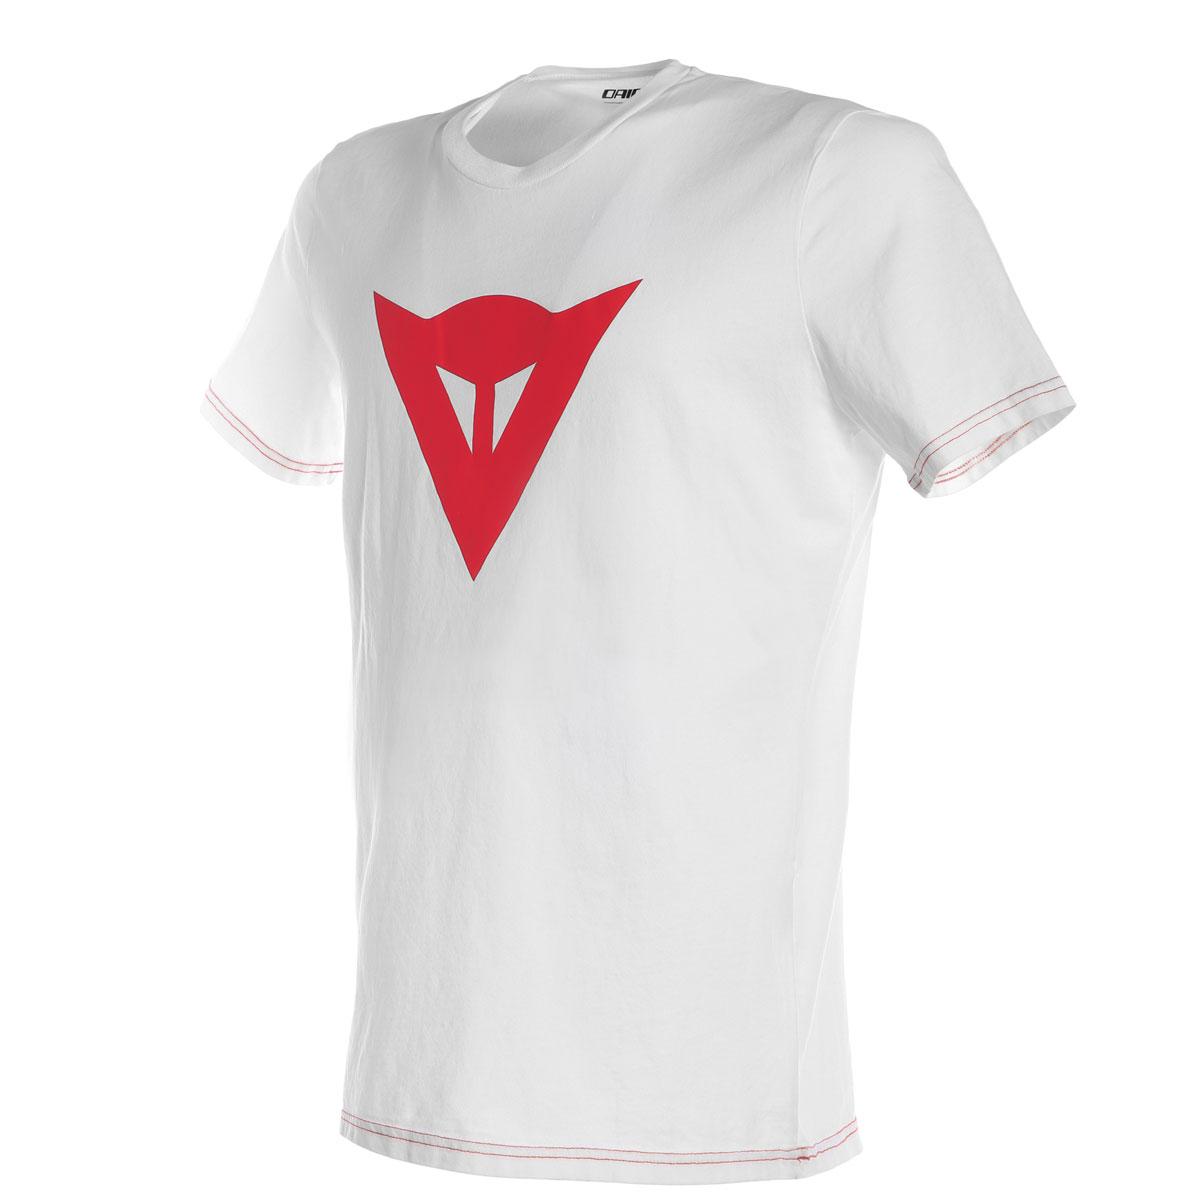 Dainese Men's Speed Demon White T-Shirt